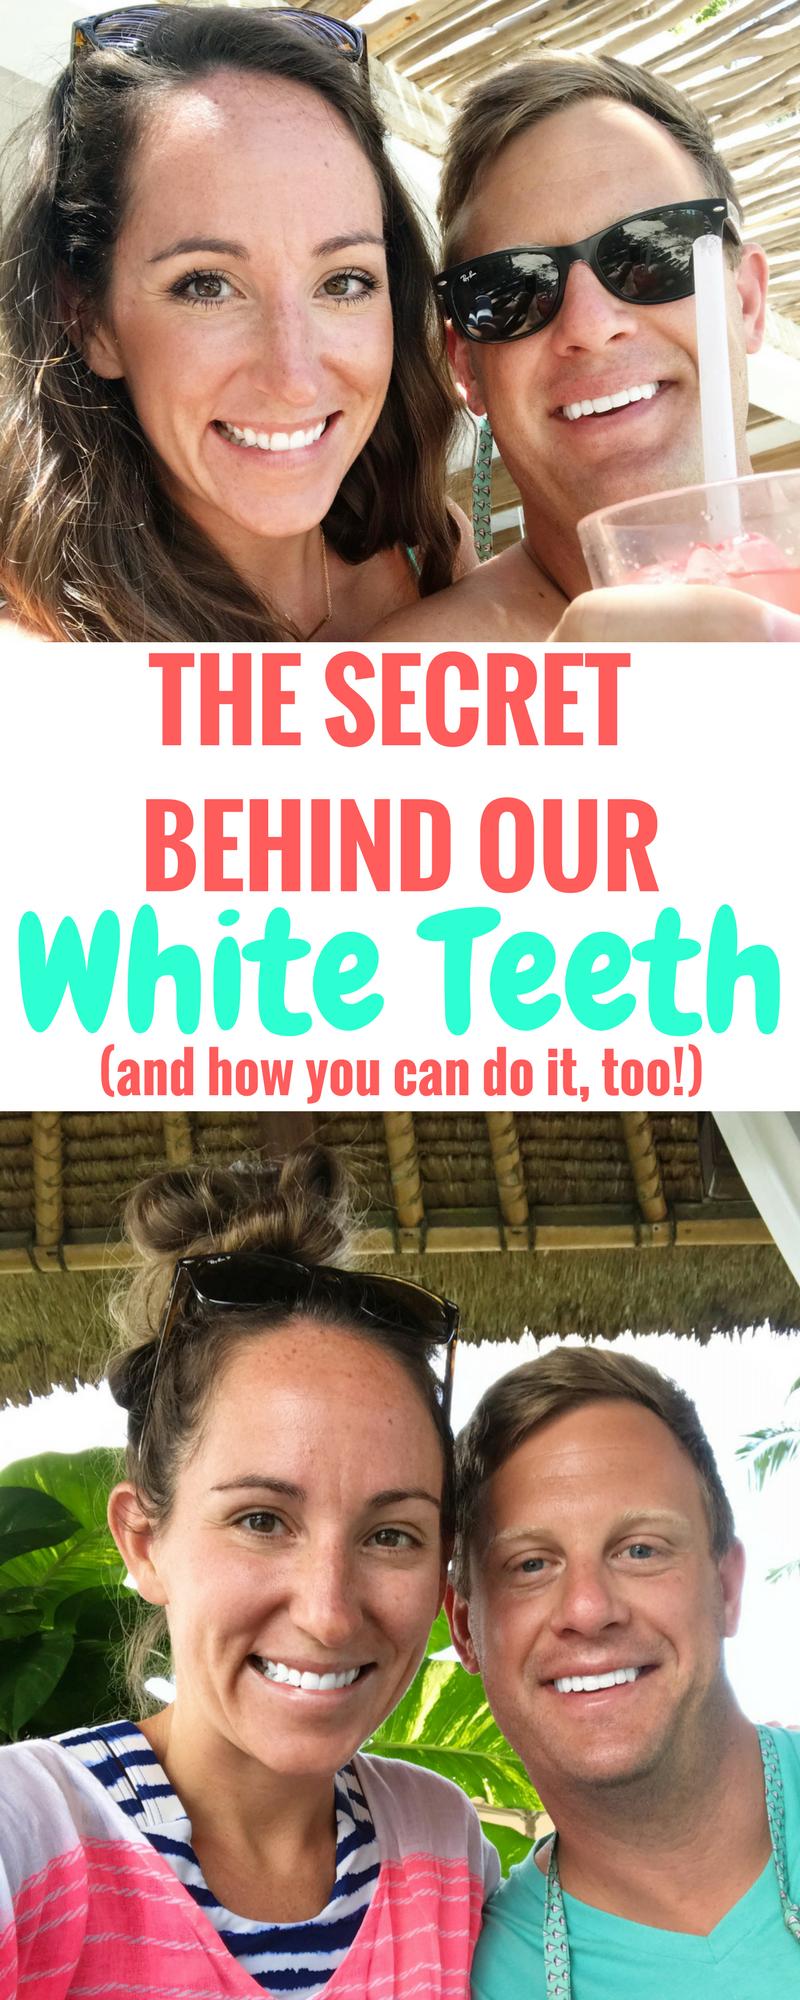 How I Whiten My Teeth - Beauty Hack - Communikait - Whiten Teeth At Home  - DIY Teeth Whitening - Cheap Teeth Whitening - Easy Beauty Hack